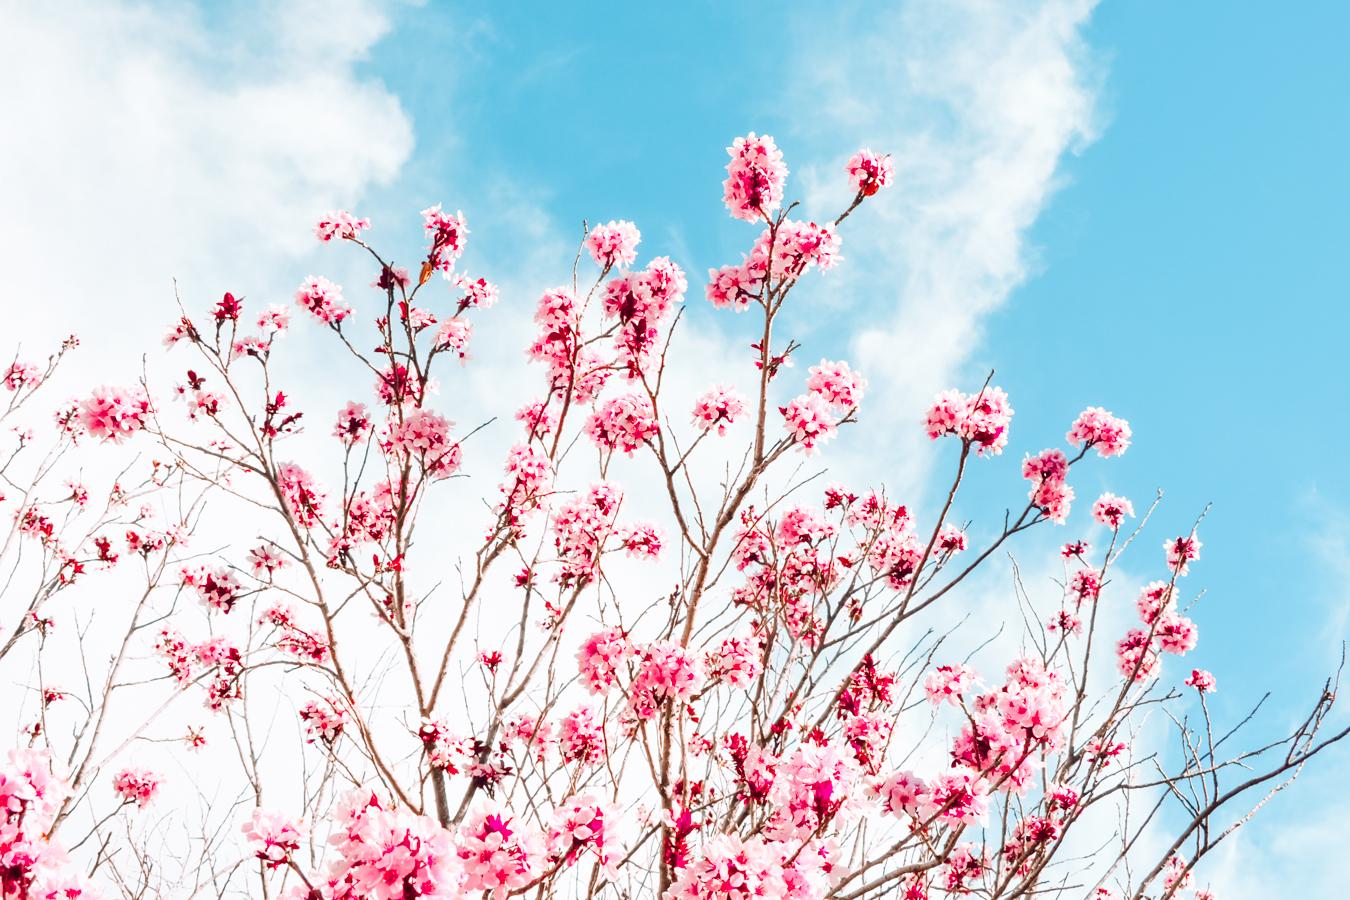 Pink flowers in Albuquerque